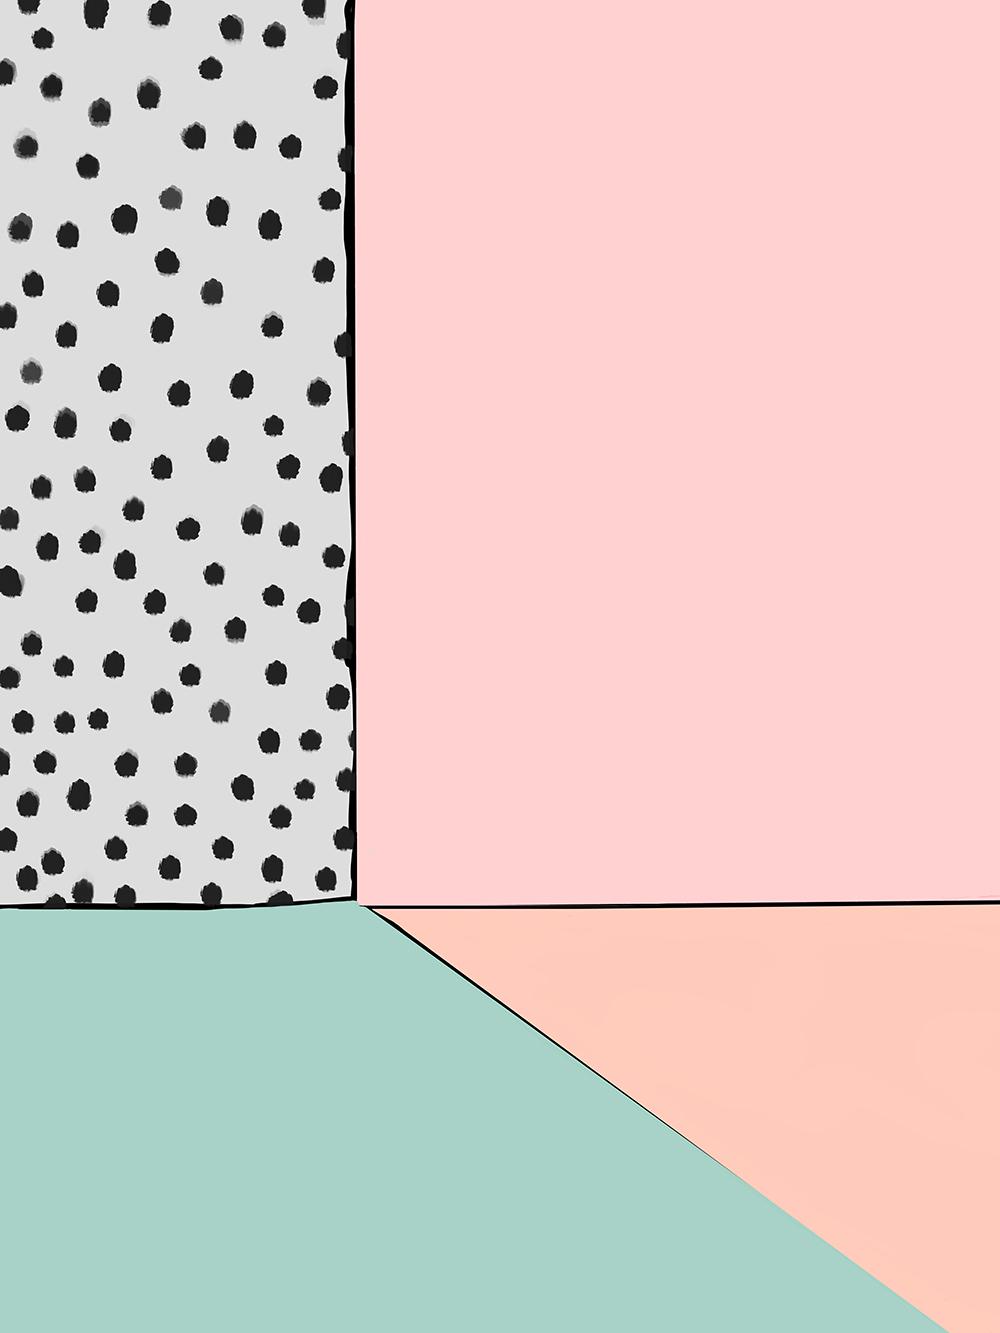 Abstract Interior I by Jules Tillman, 2016 Digital Painting